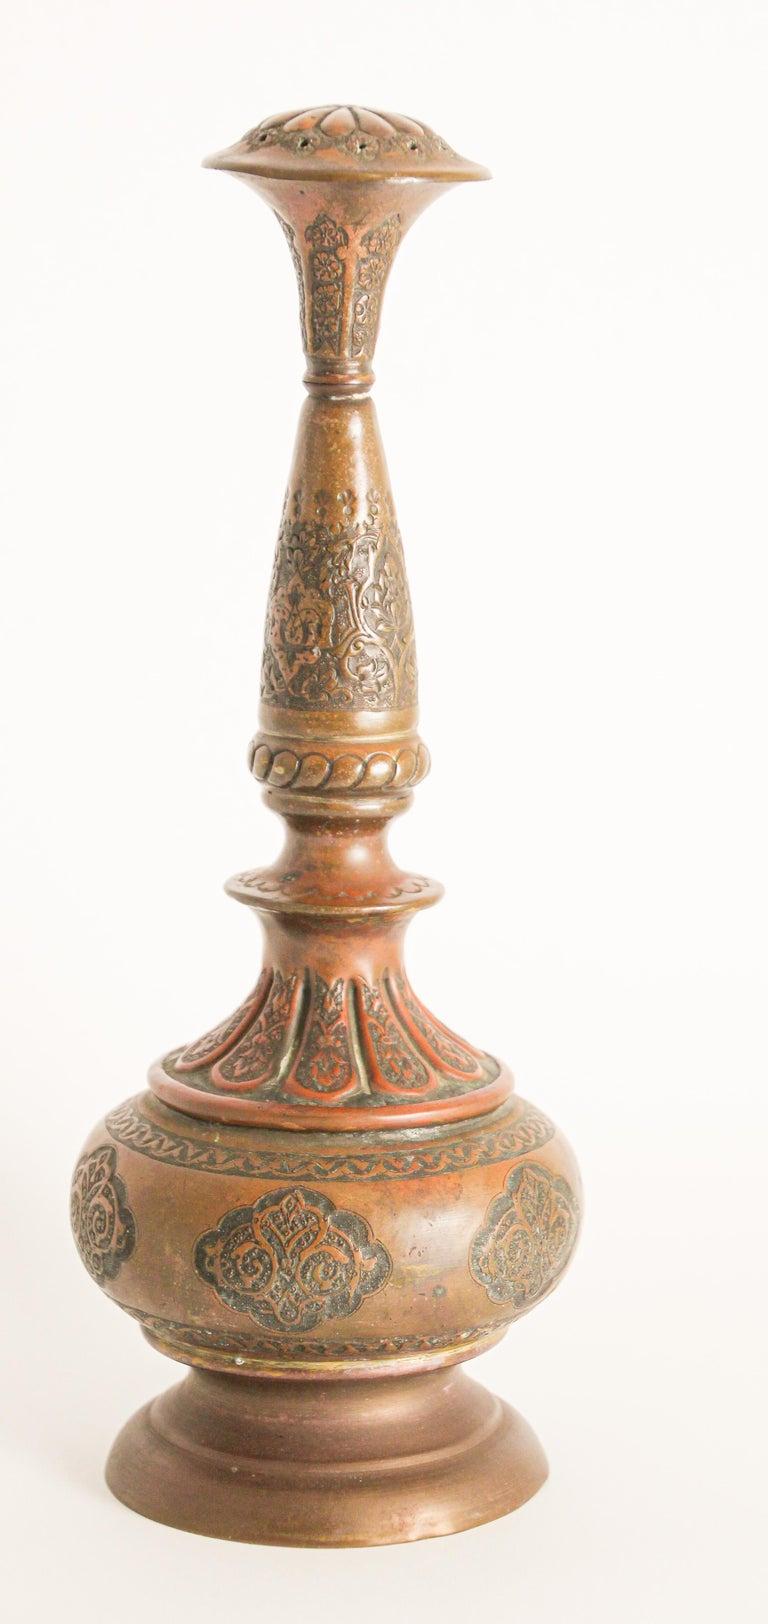 Ottoman Mameluke Decorative Copper Rosewater Perfume Sprinkler For Sale 2